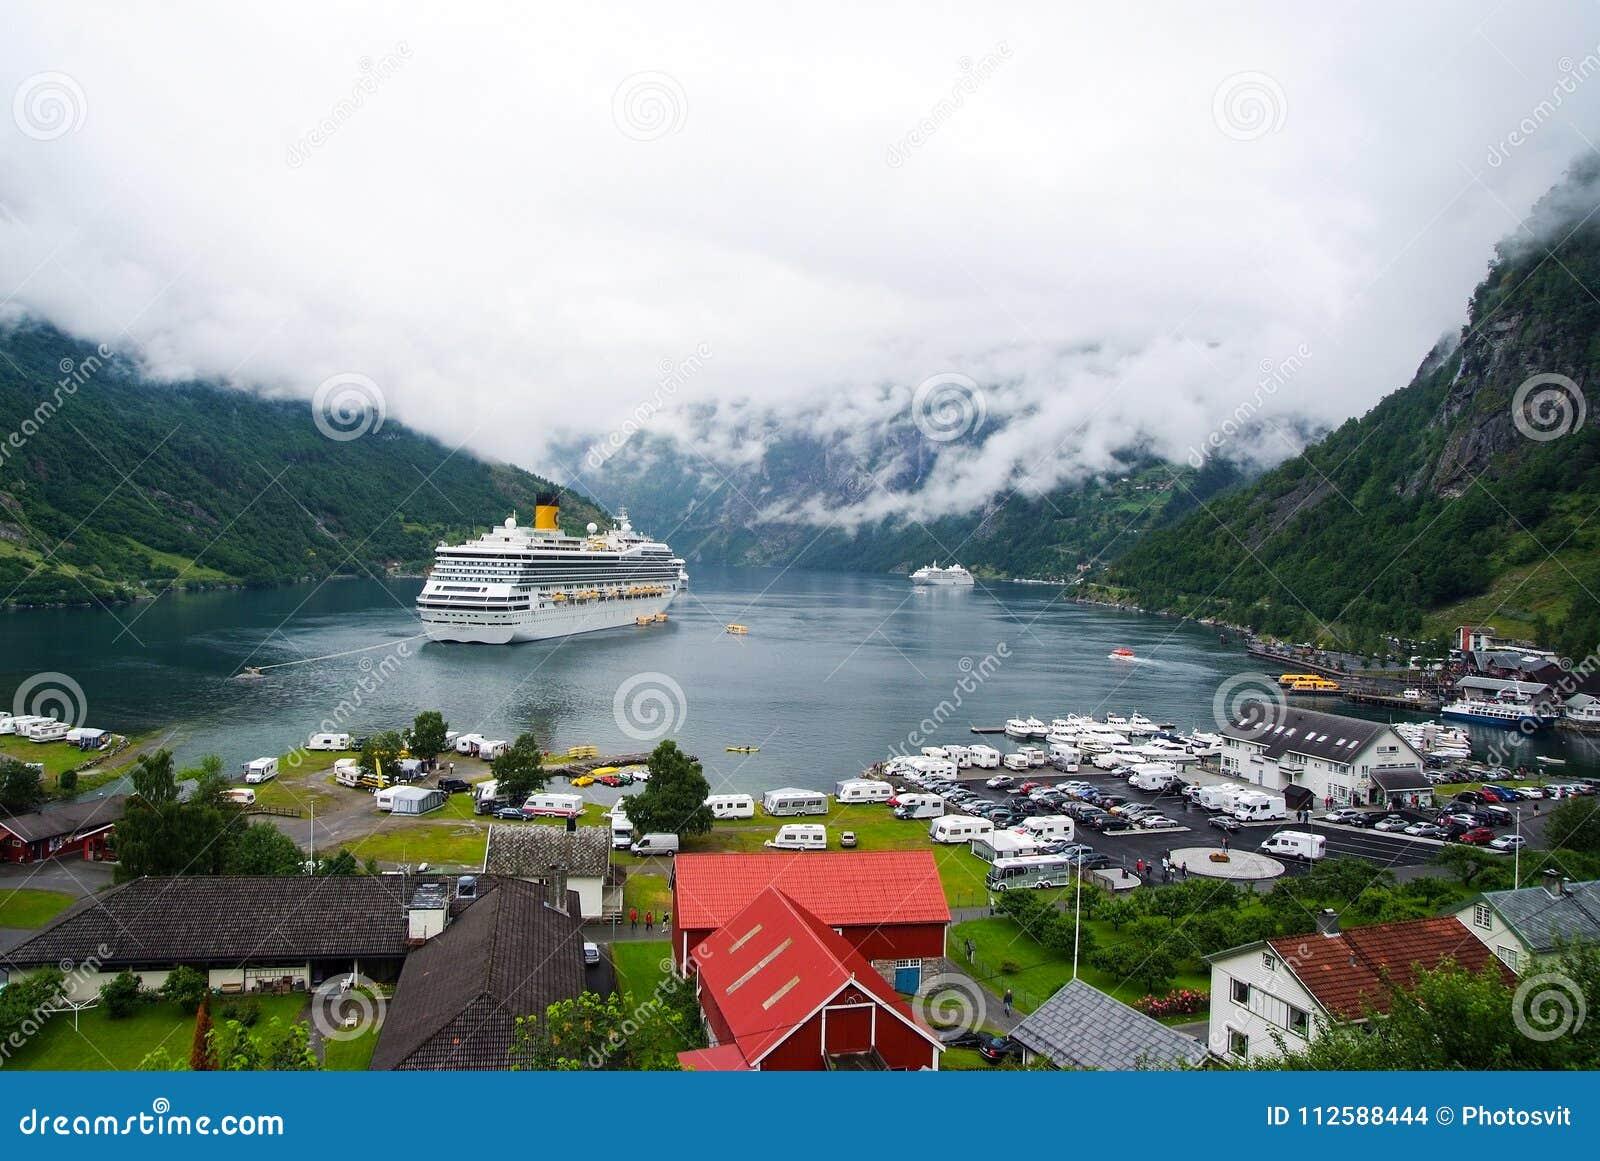 Geiranger,挪威- 2010年1月25日:船在多云天空的挪威海湾 远洋班轮在村庄港口 旅行目的地,